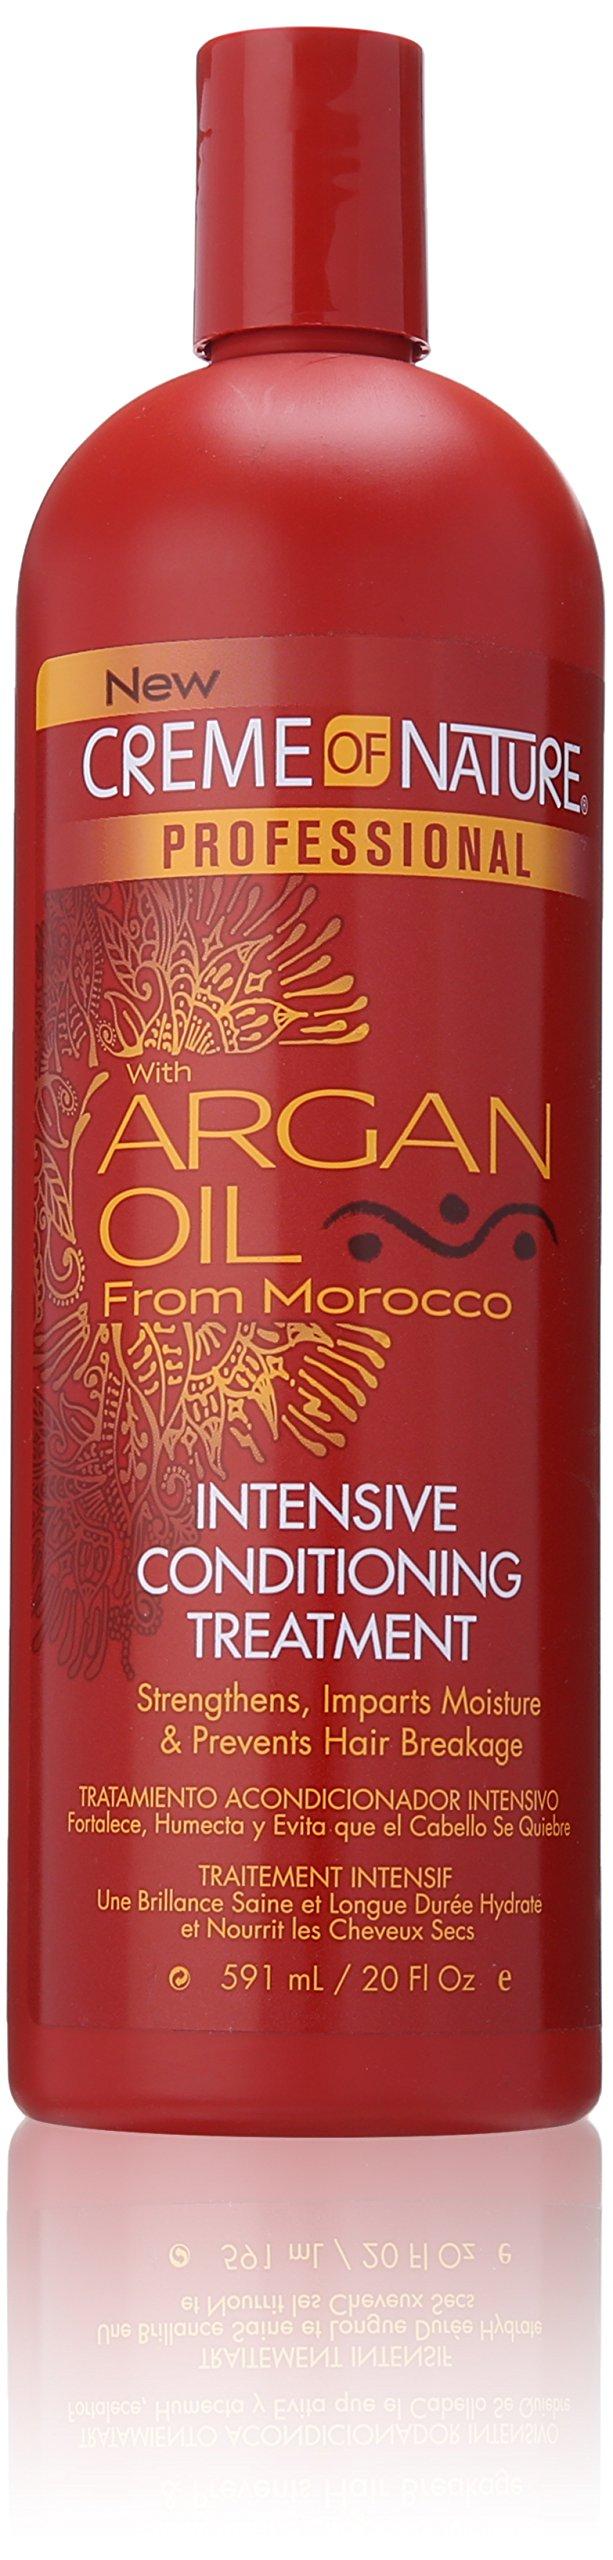 Creme Of Nature Argan Oil Advanced Straightening Regular